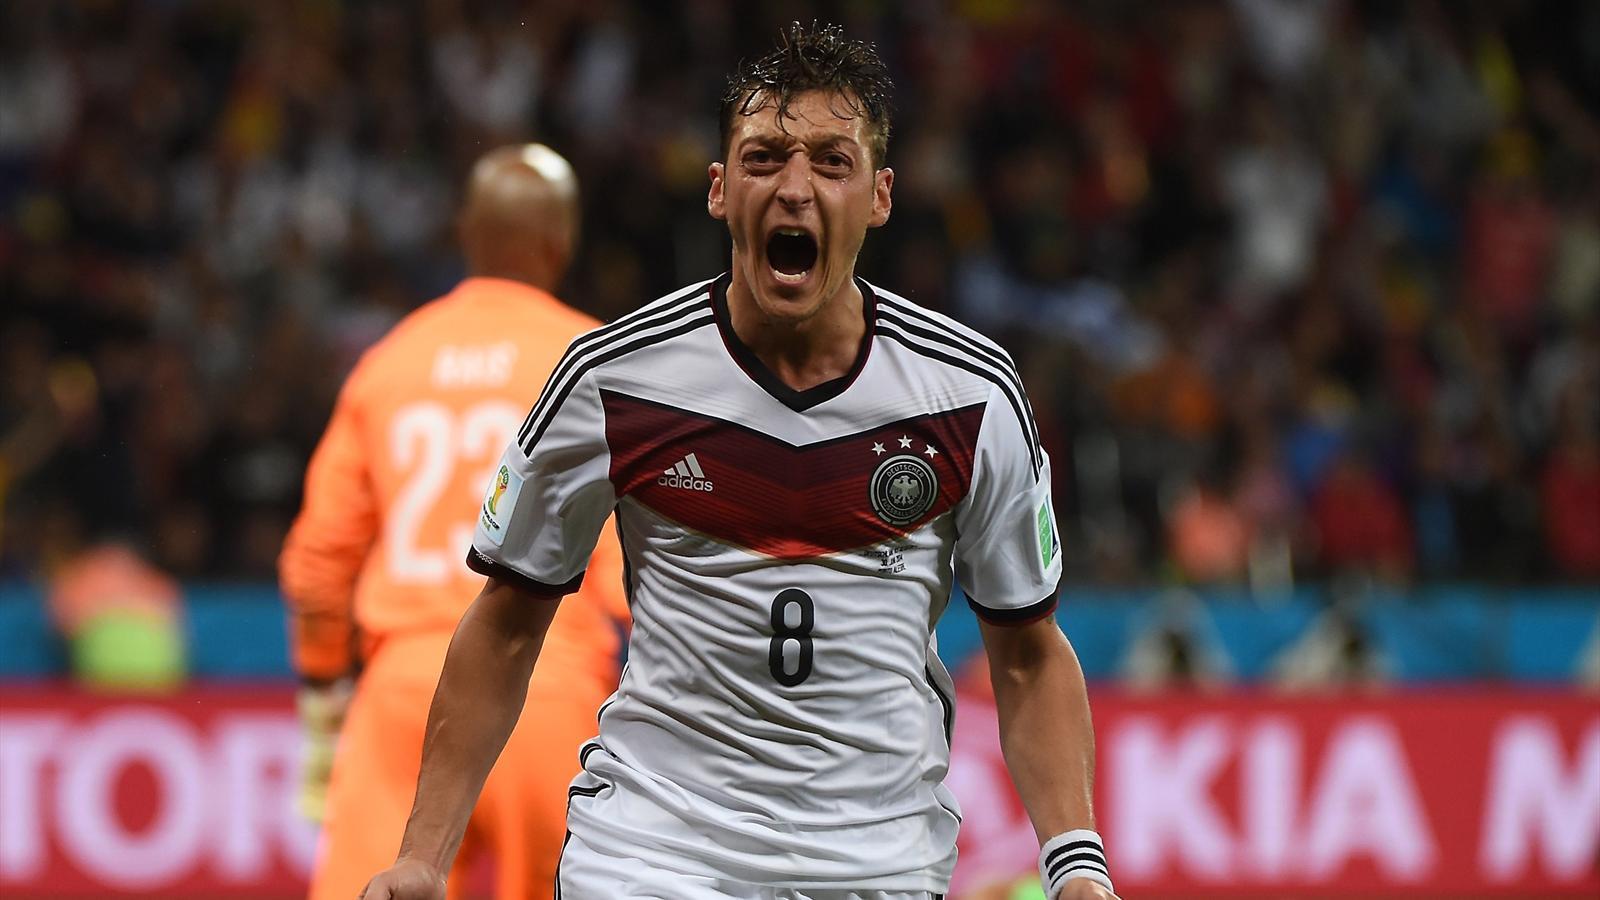 Mesut Ozil (Allemagne) fête son but